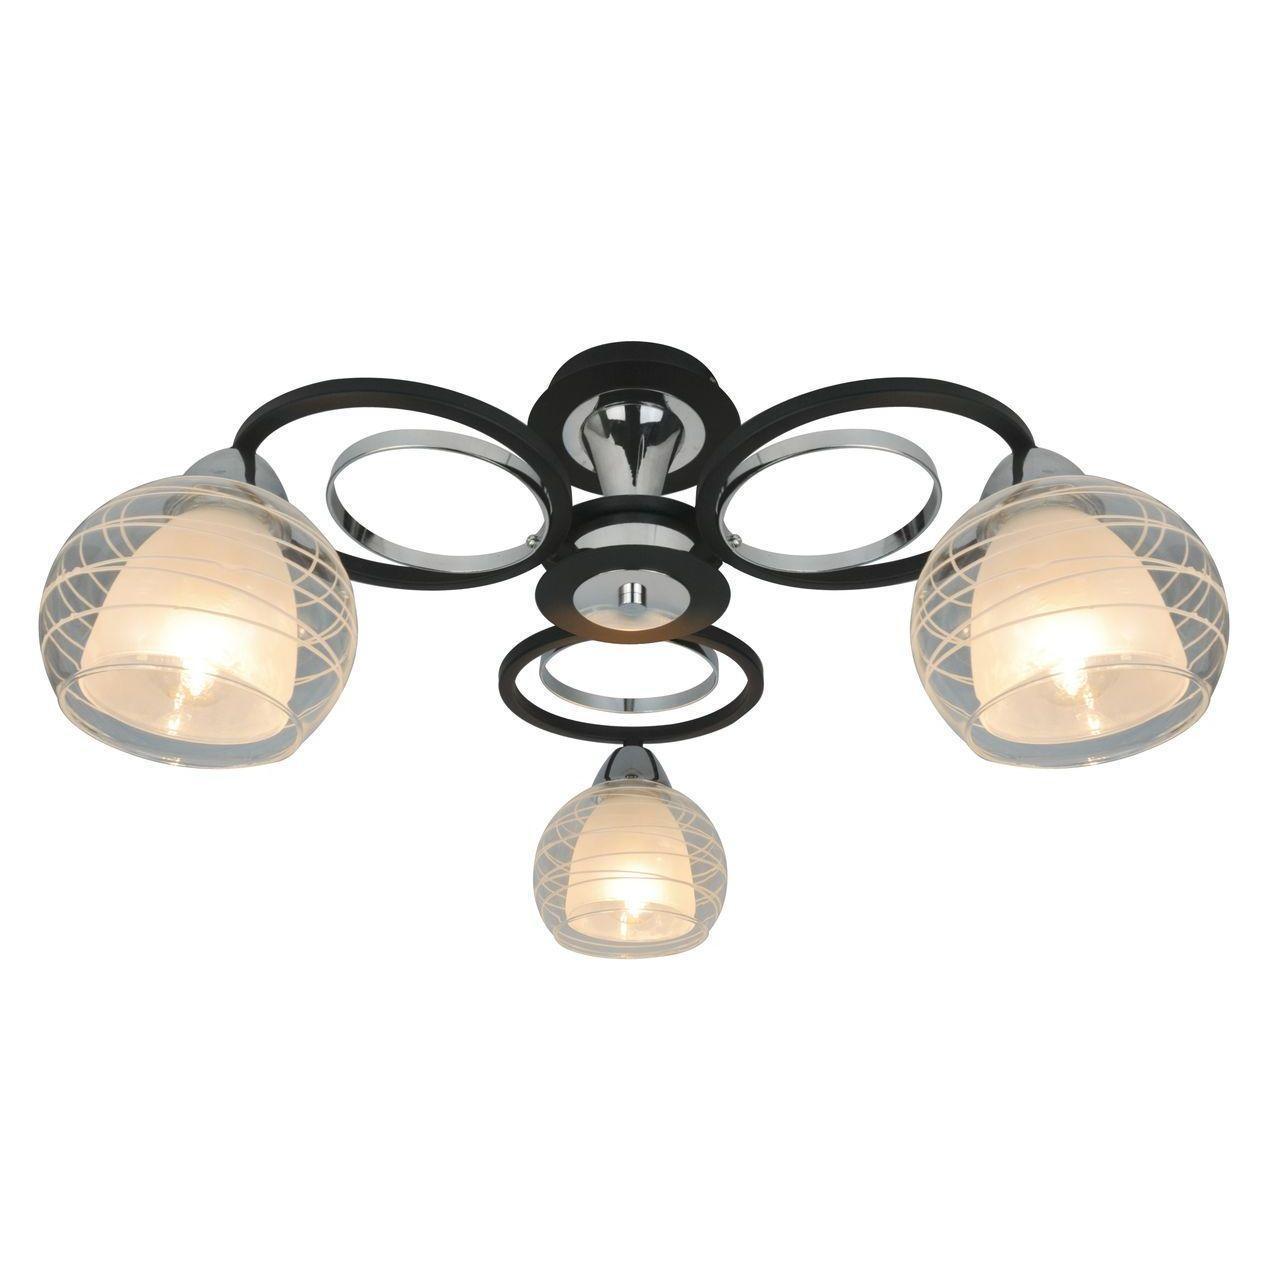 Потолочная люстра Arte Lamp Ginevra A1604PL-3BK накладной светильник arte lamp falcon a5633pl 3bk